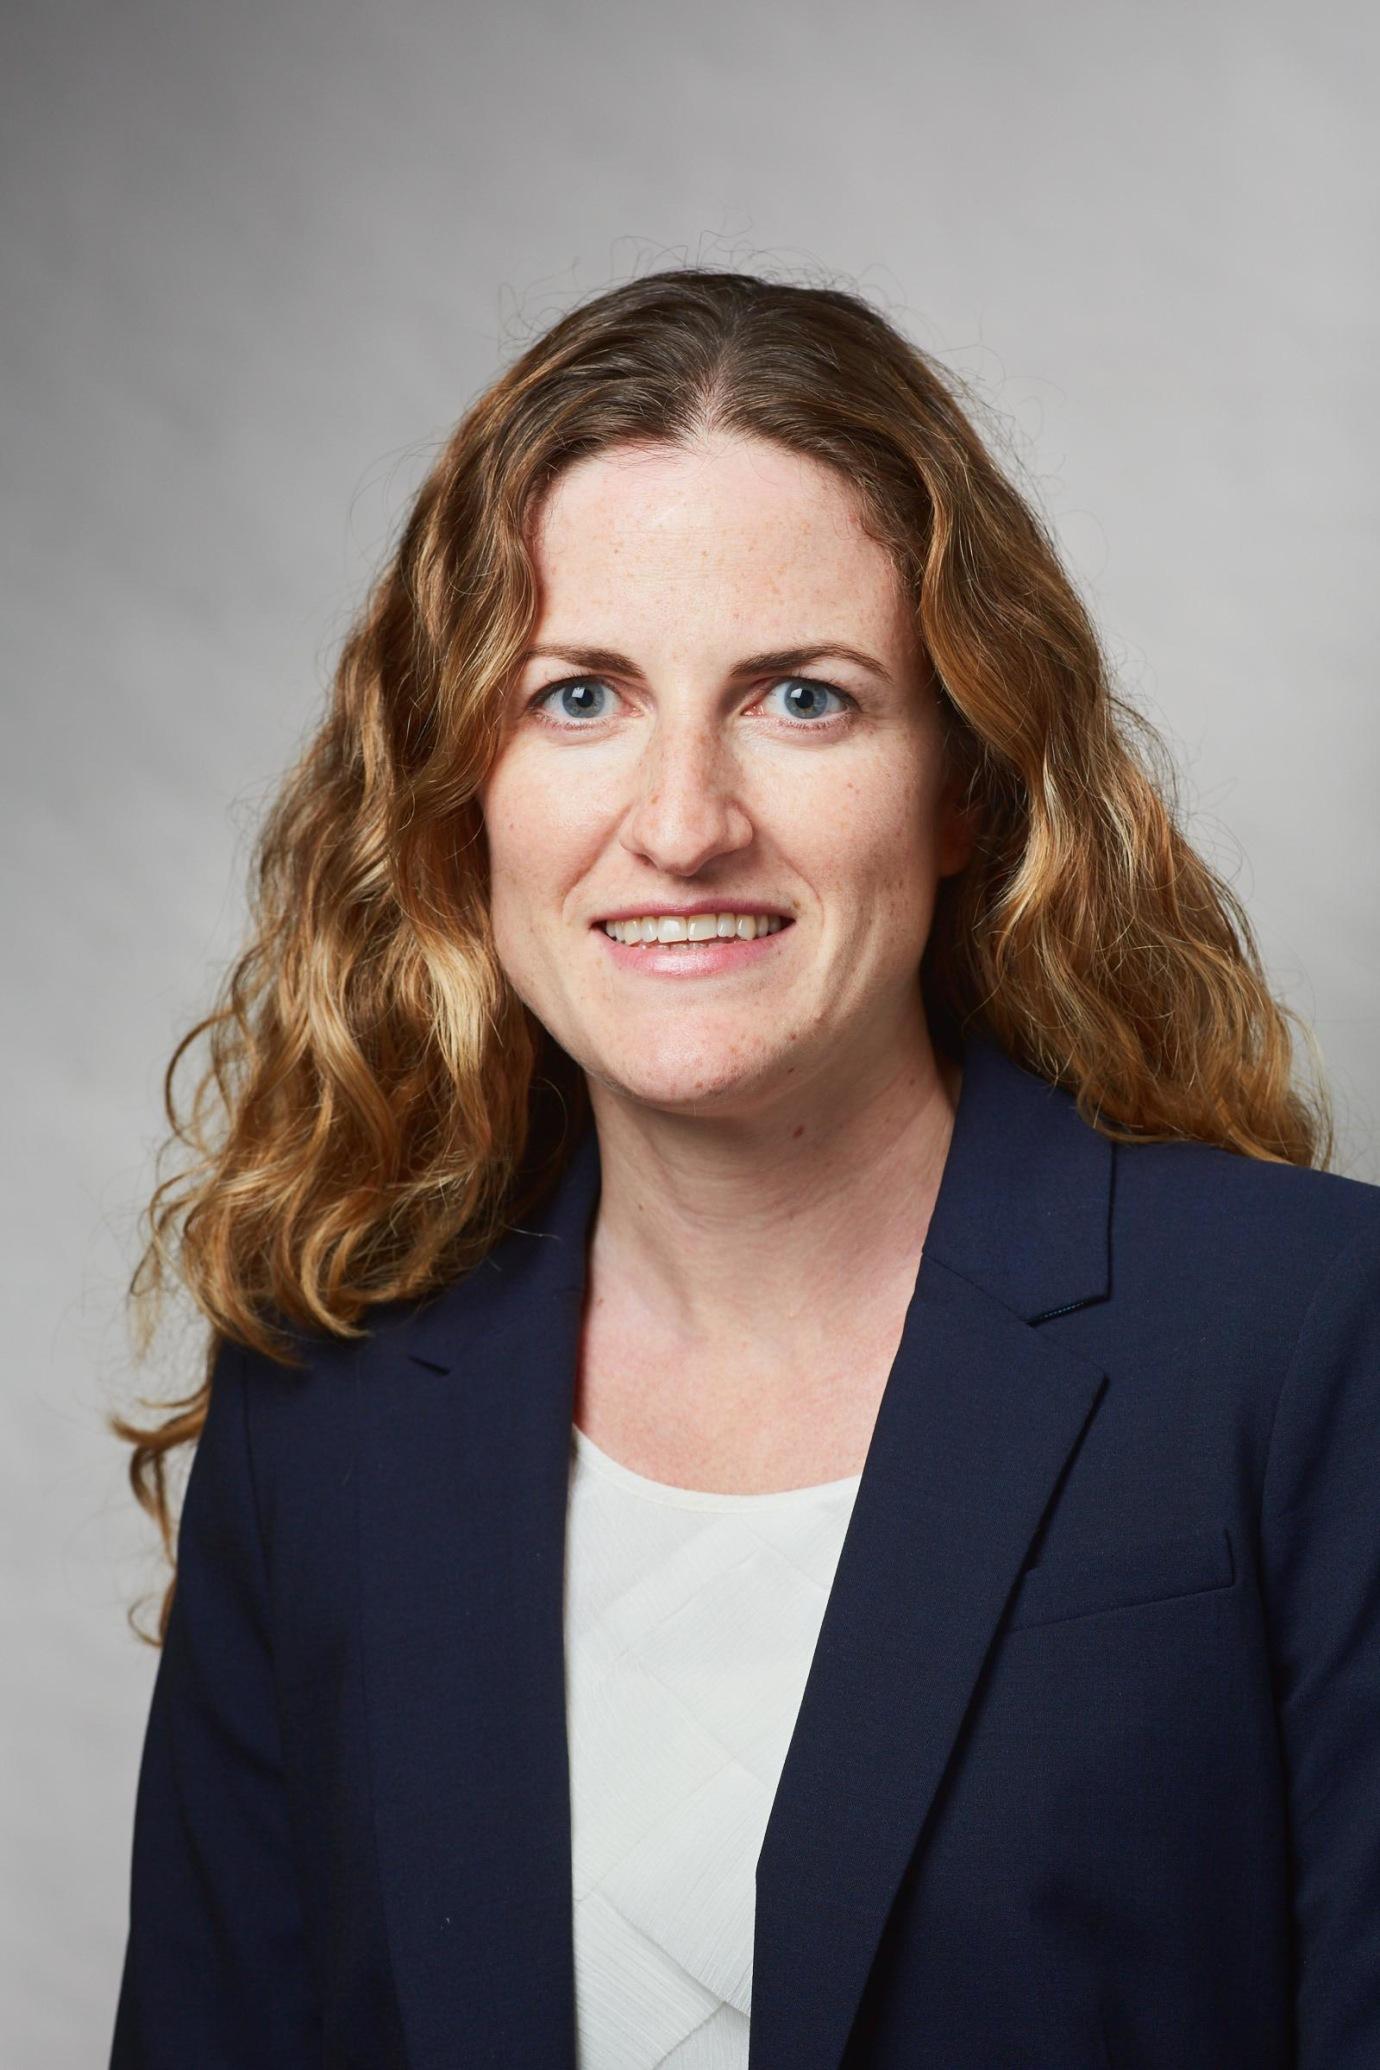 Dr. Caroline Johnson